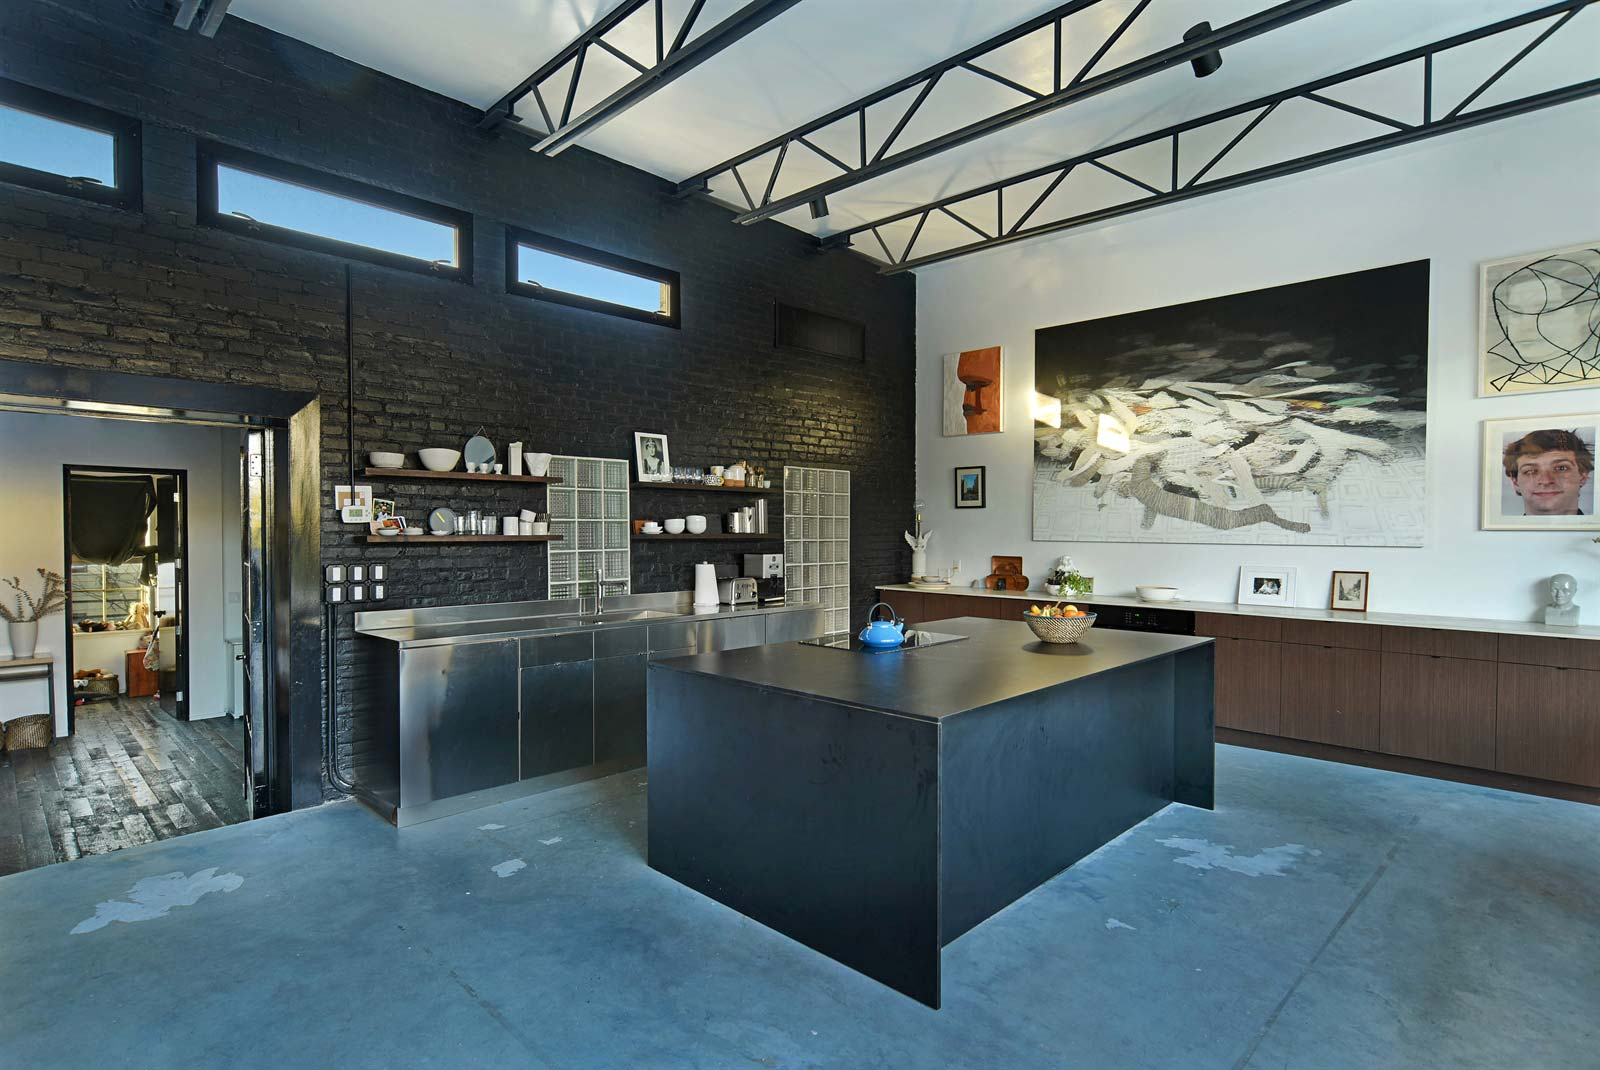 cuisine en m tal avec lot central. Black Bedroom Furniture Sets. Home Design Ideas